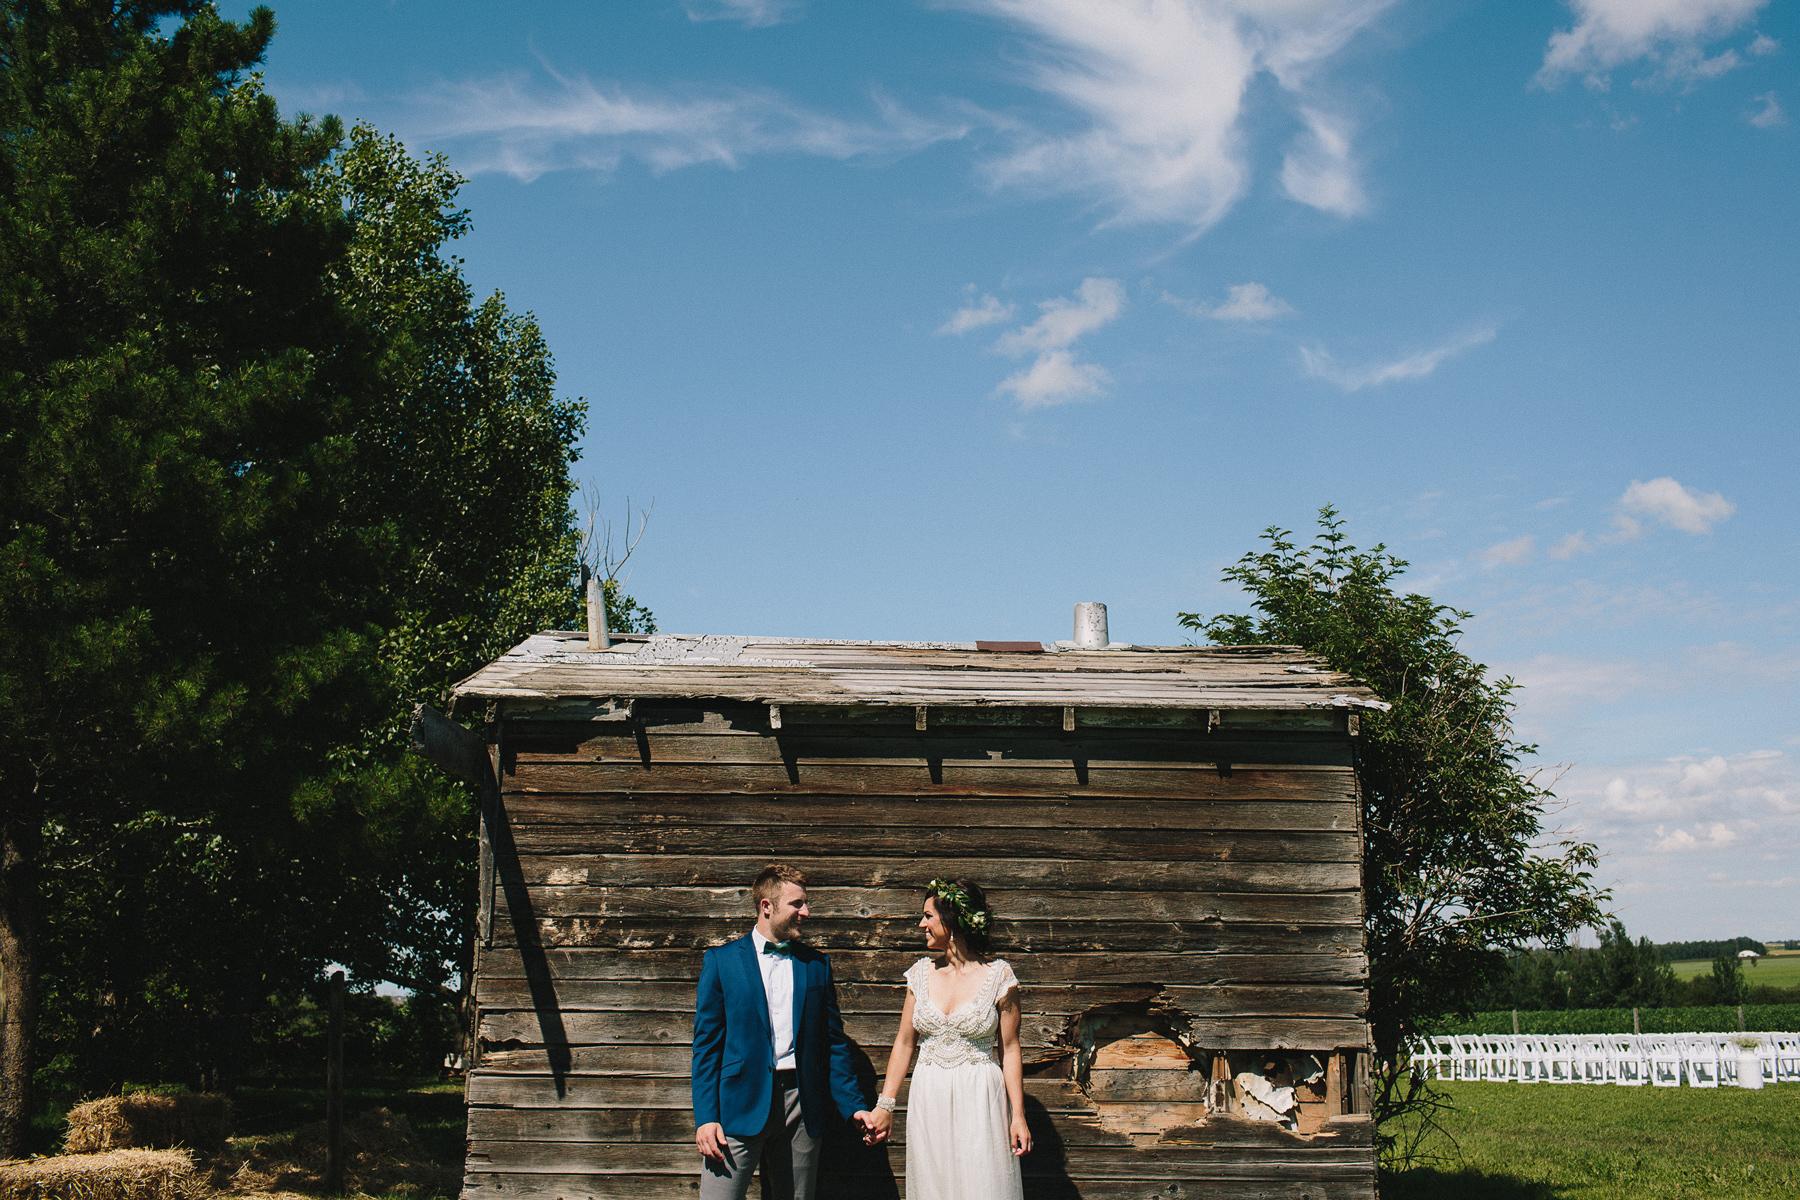 alberta-farm-wedding-photographer-rp-wj-052.jpg